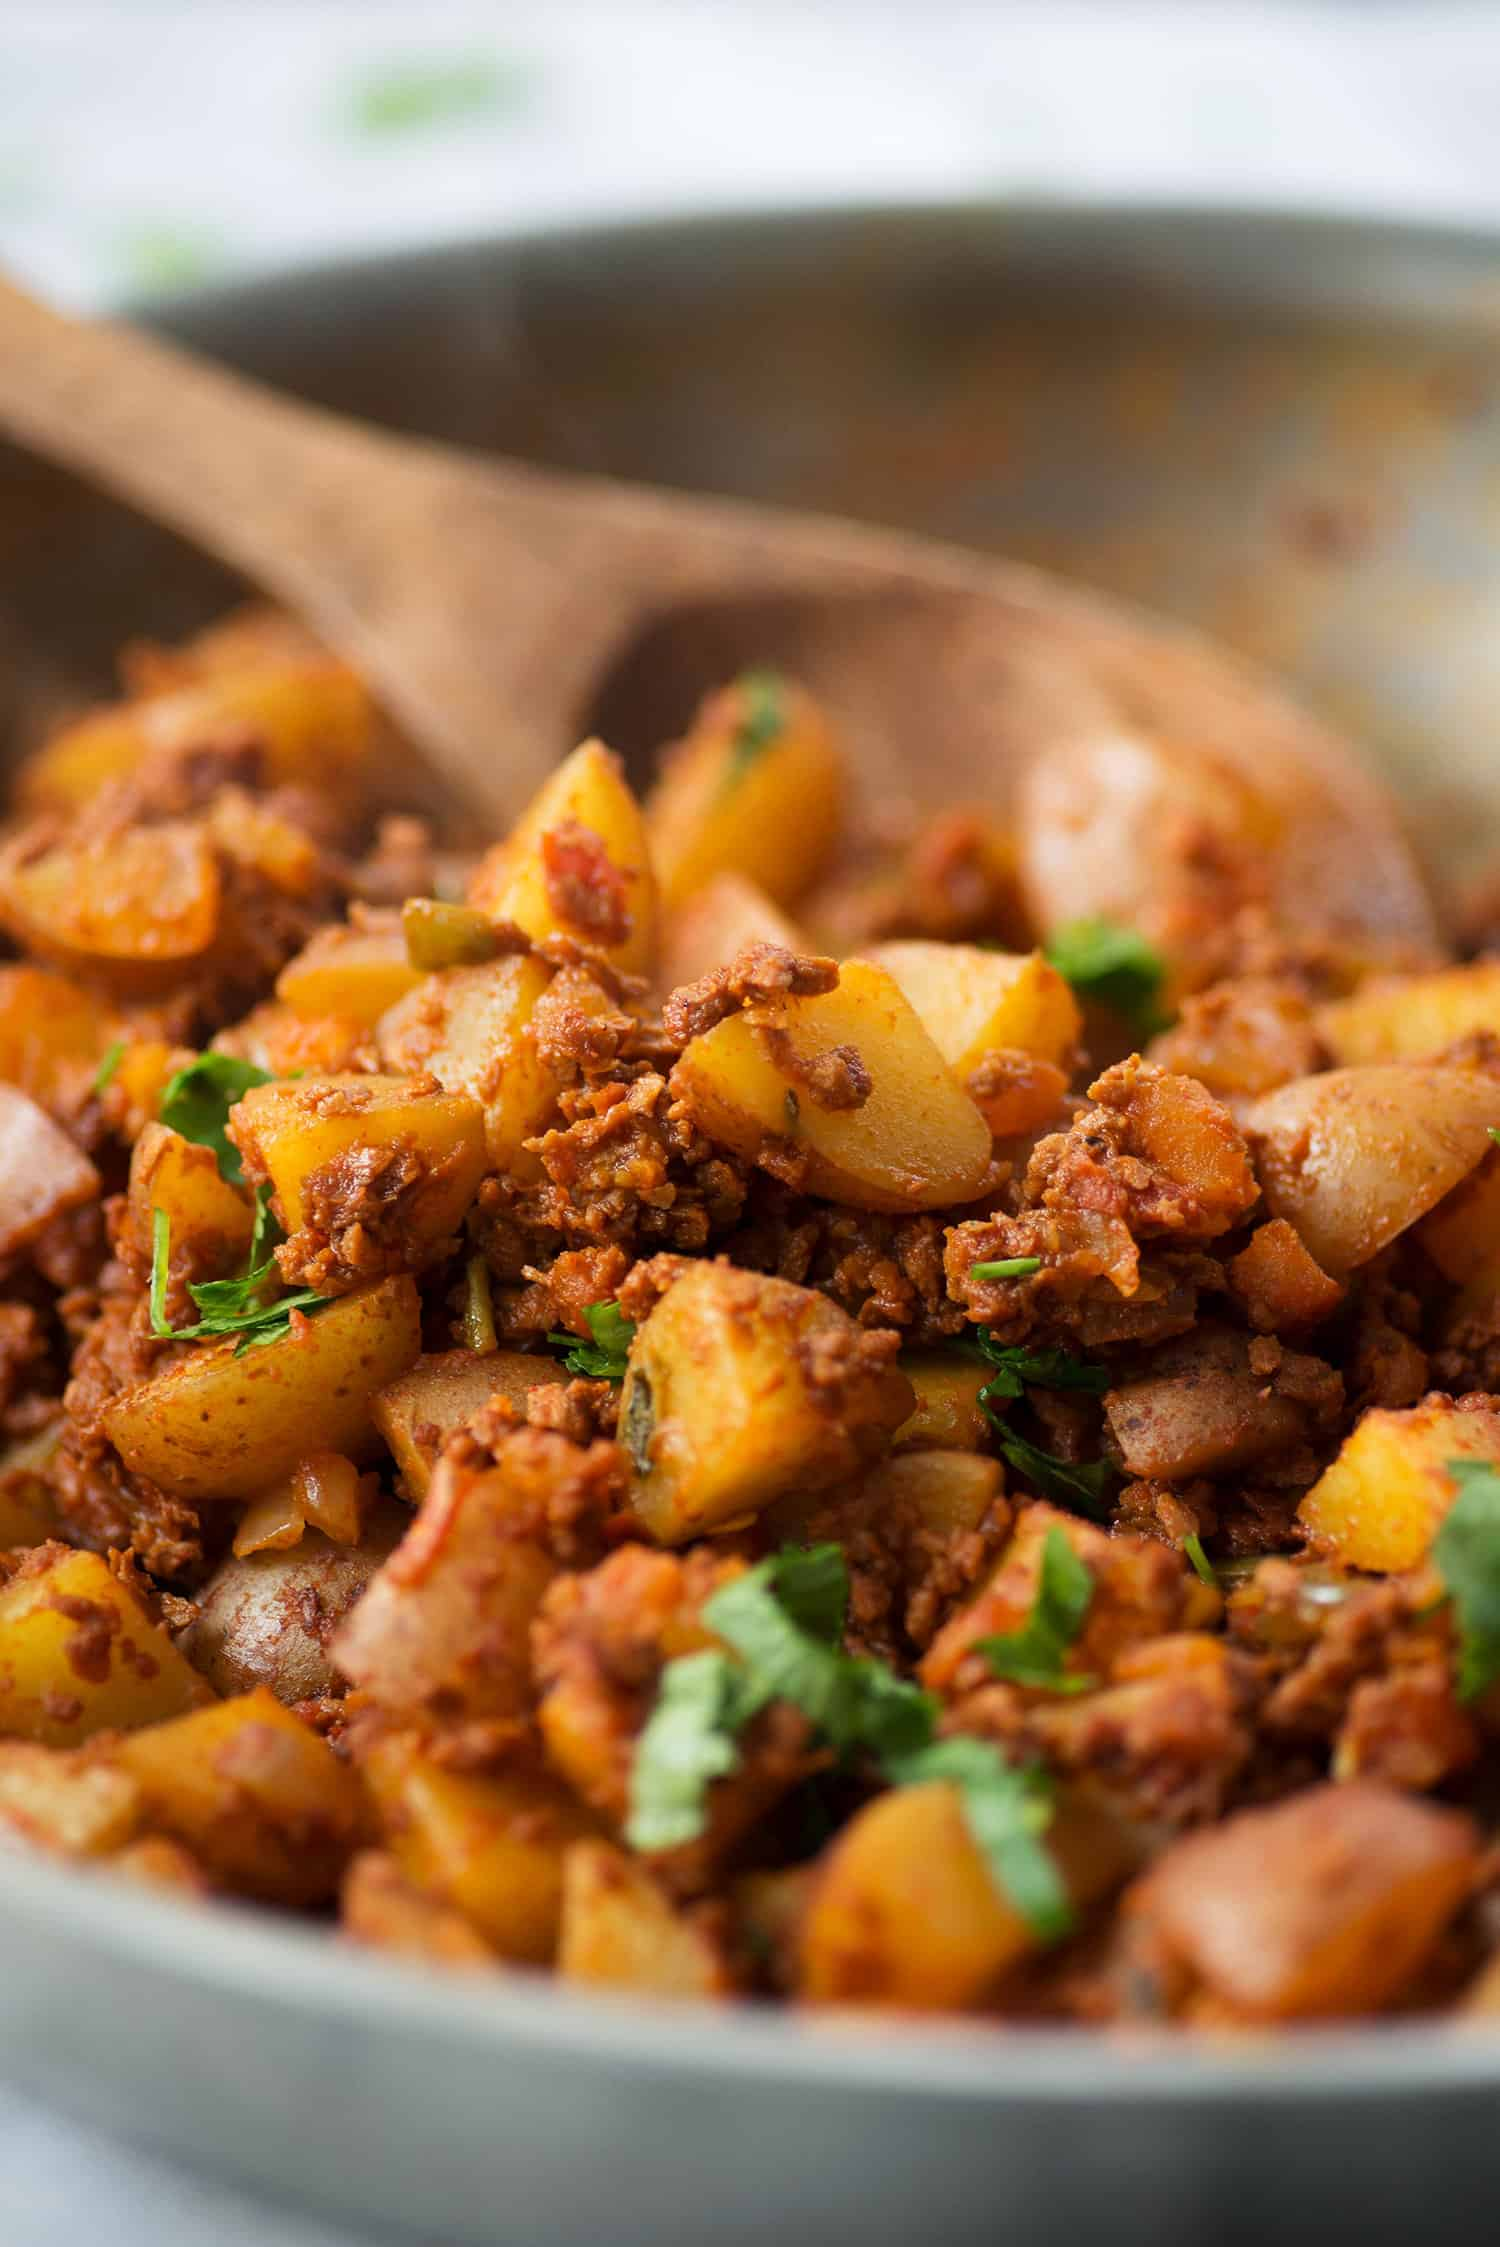 skillet with crispy potatoes and soyrizo